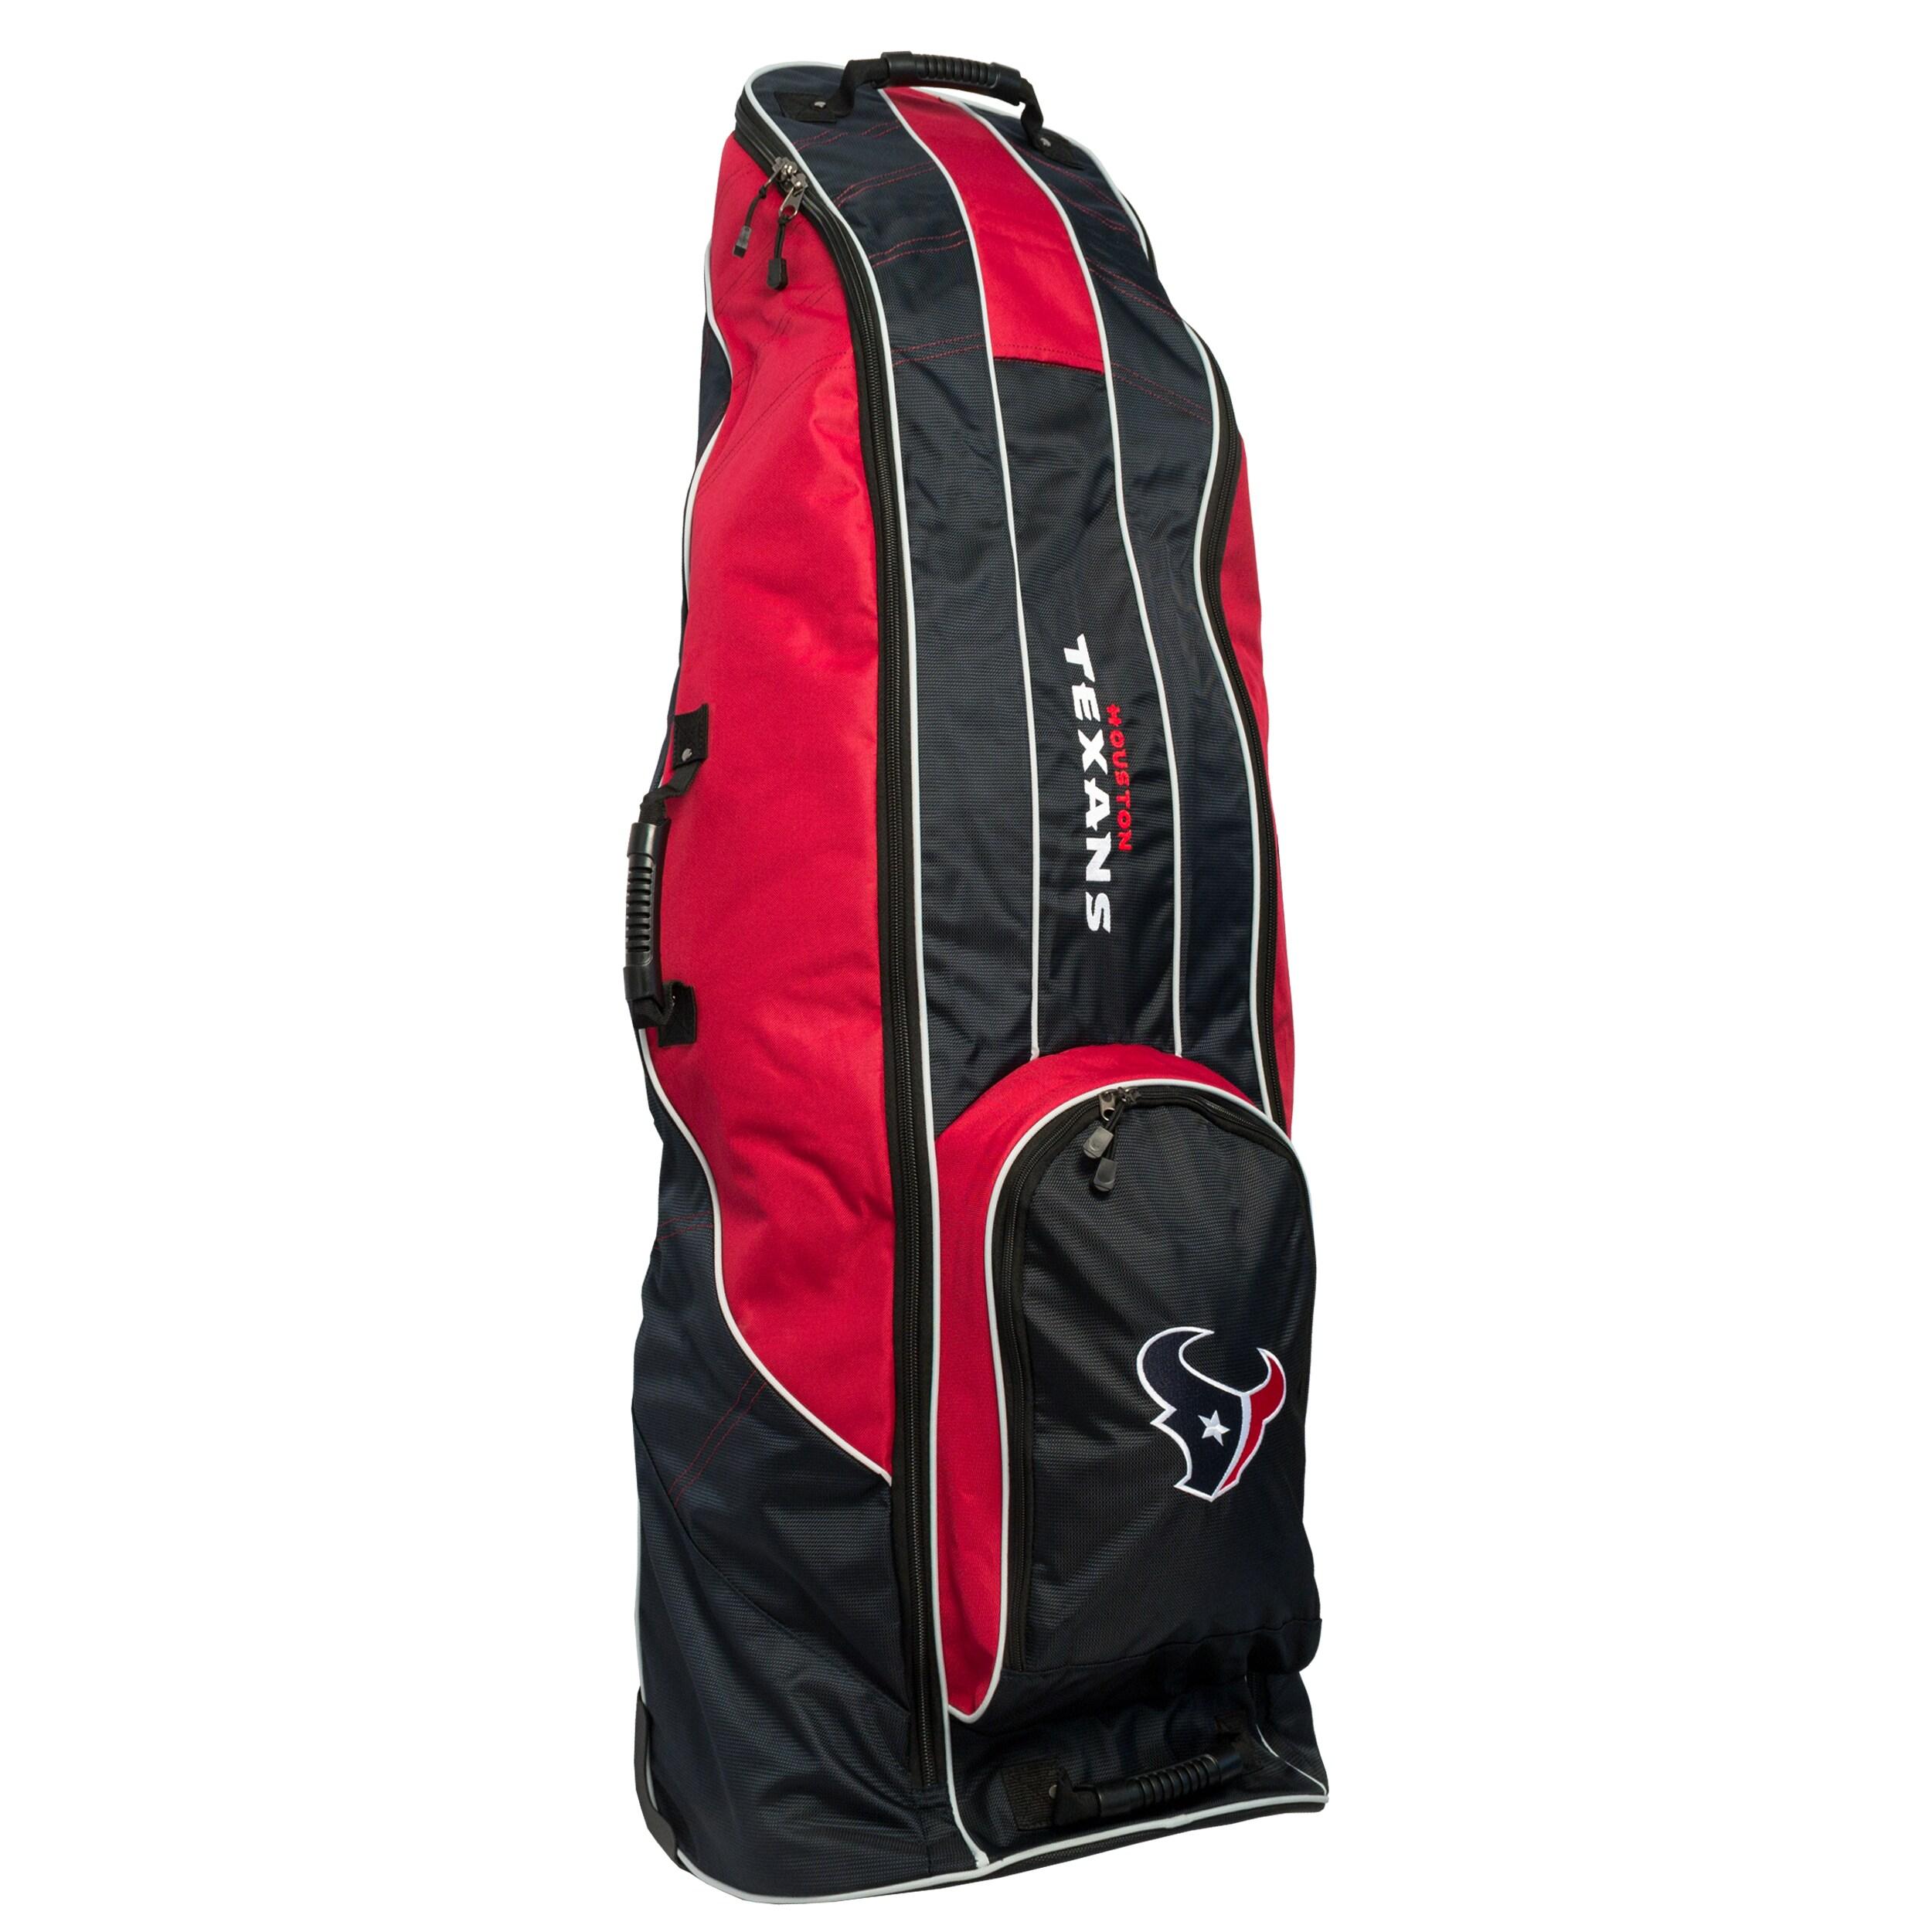 Houston Texans Team Golf Travel Bag